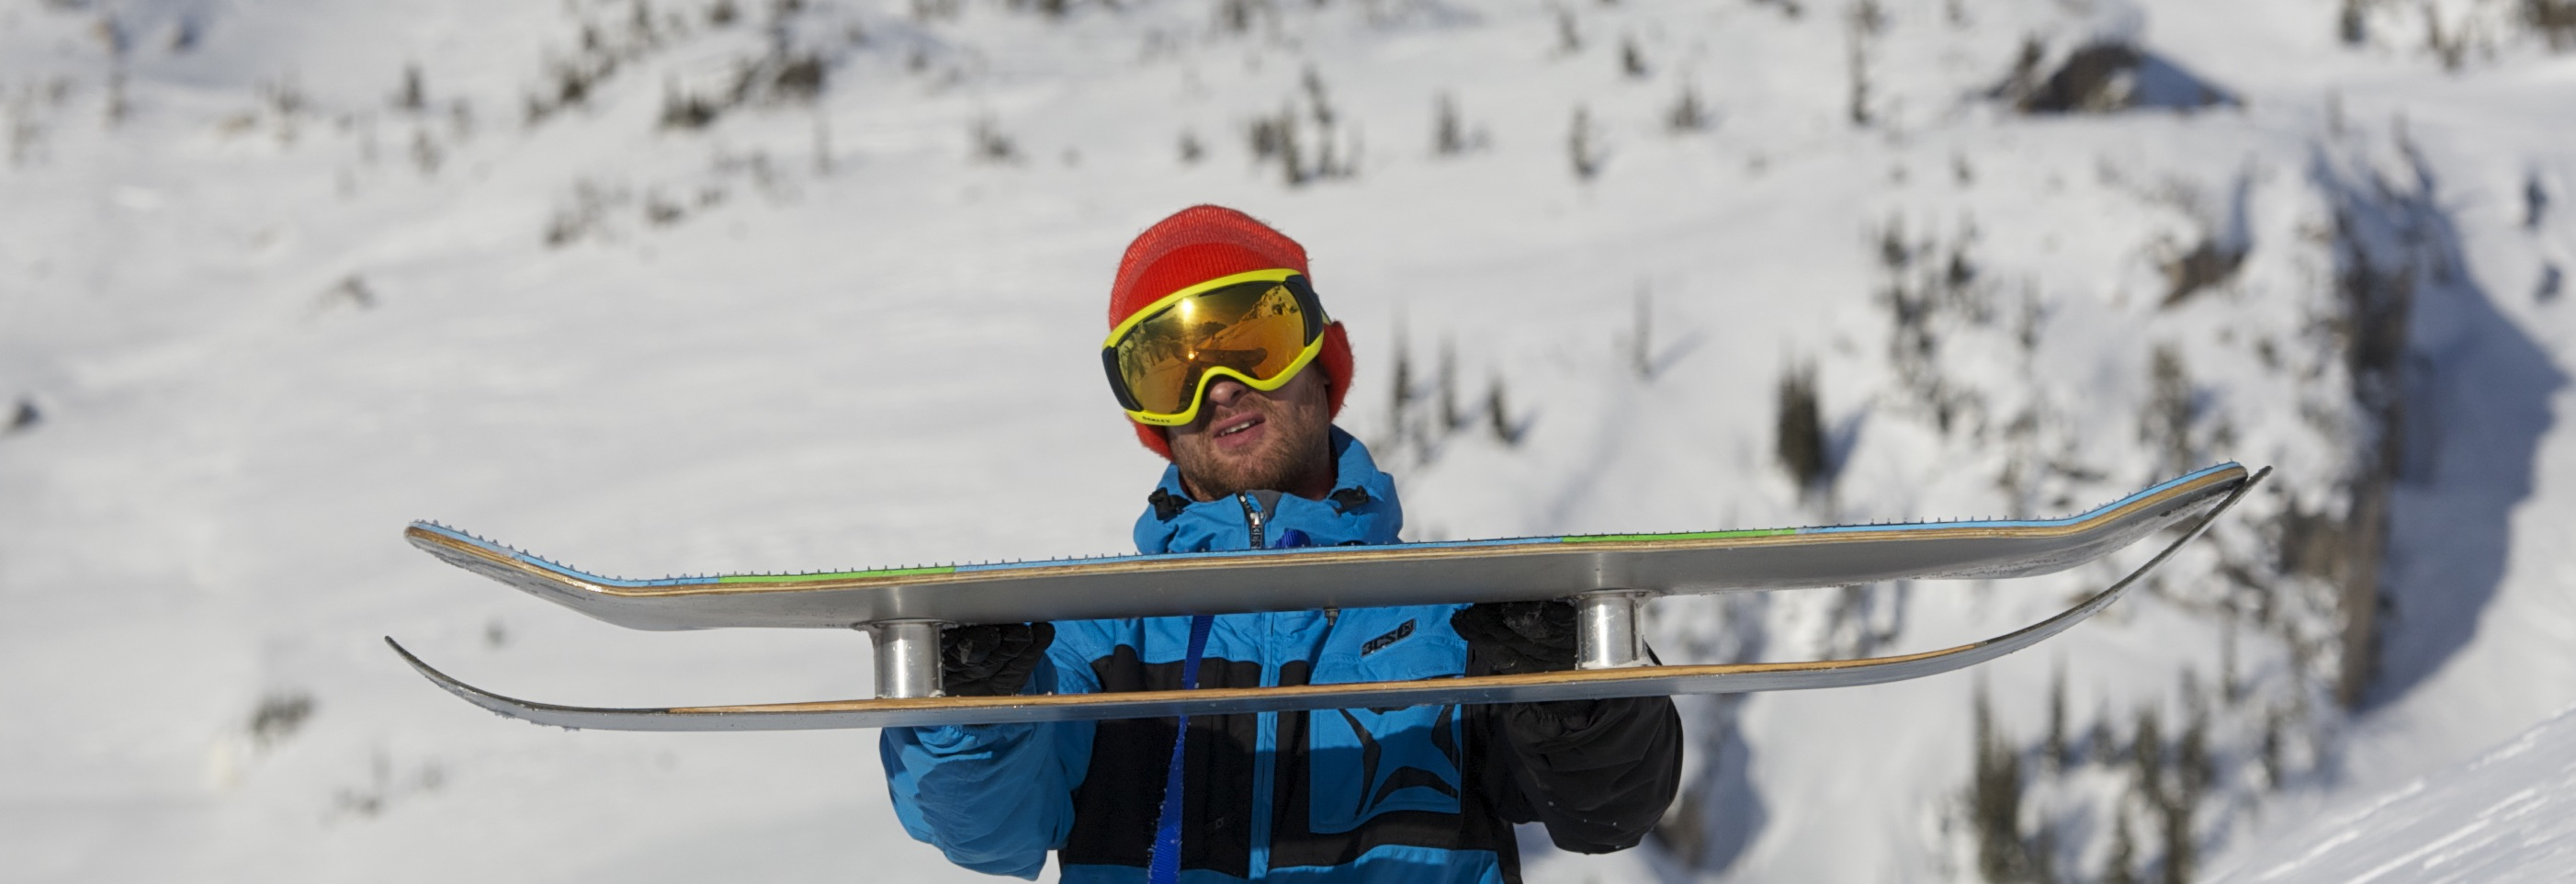 powsurf snowskate wakesurf carbon fibre